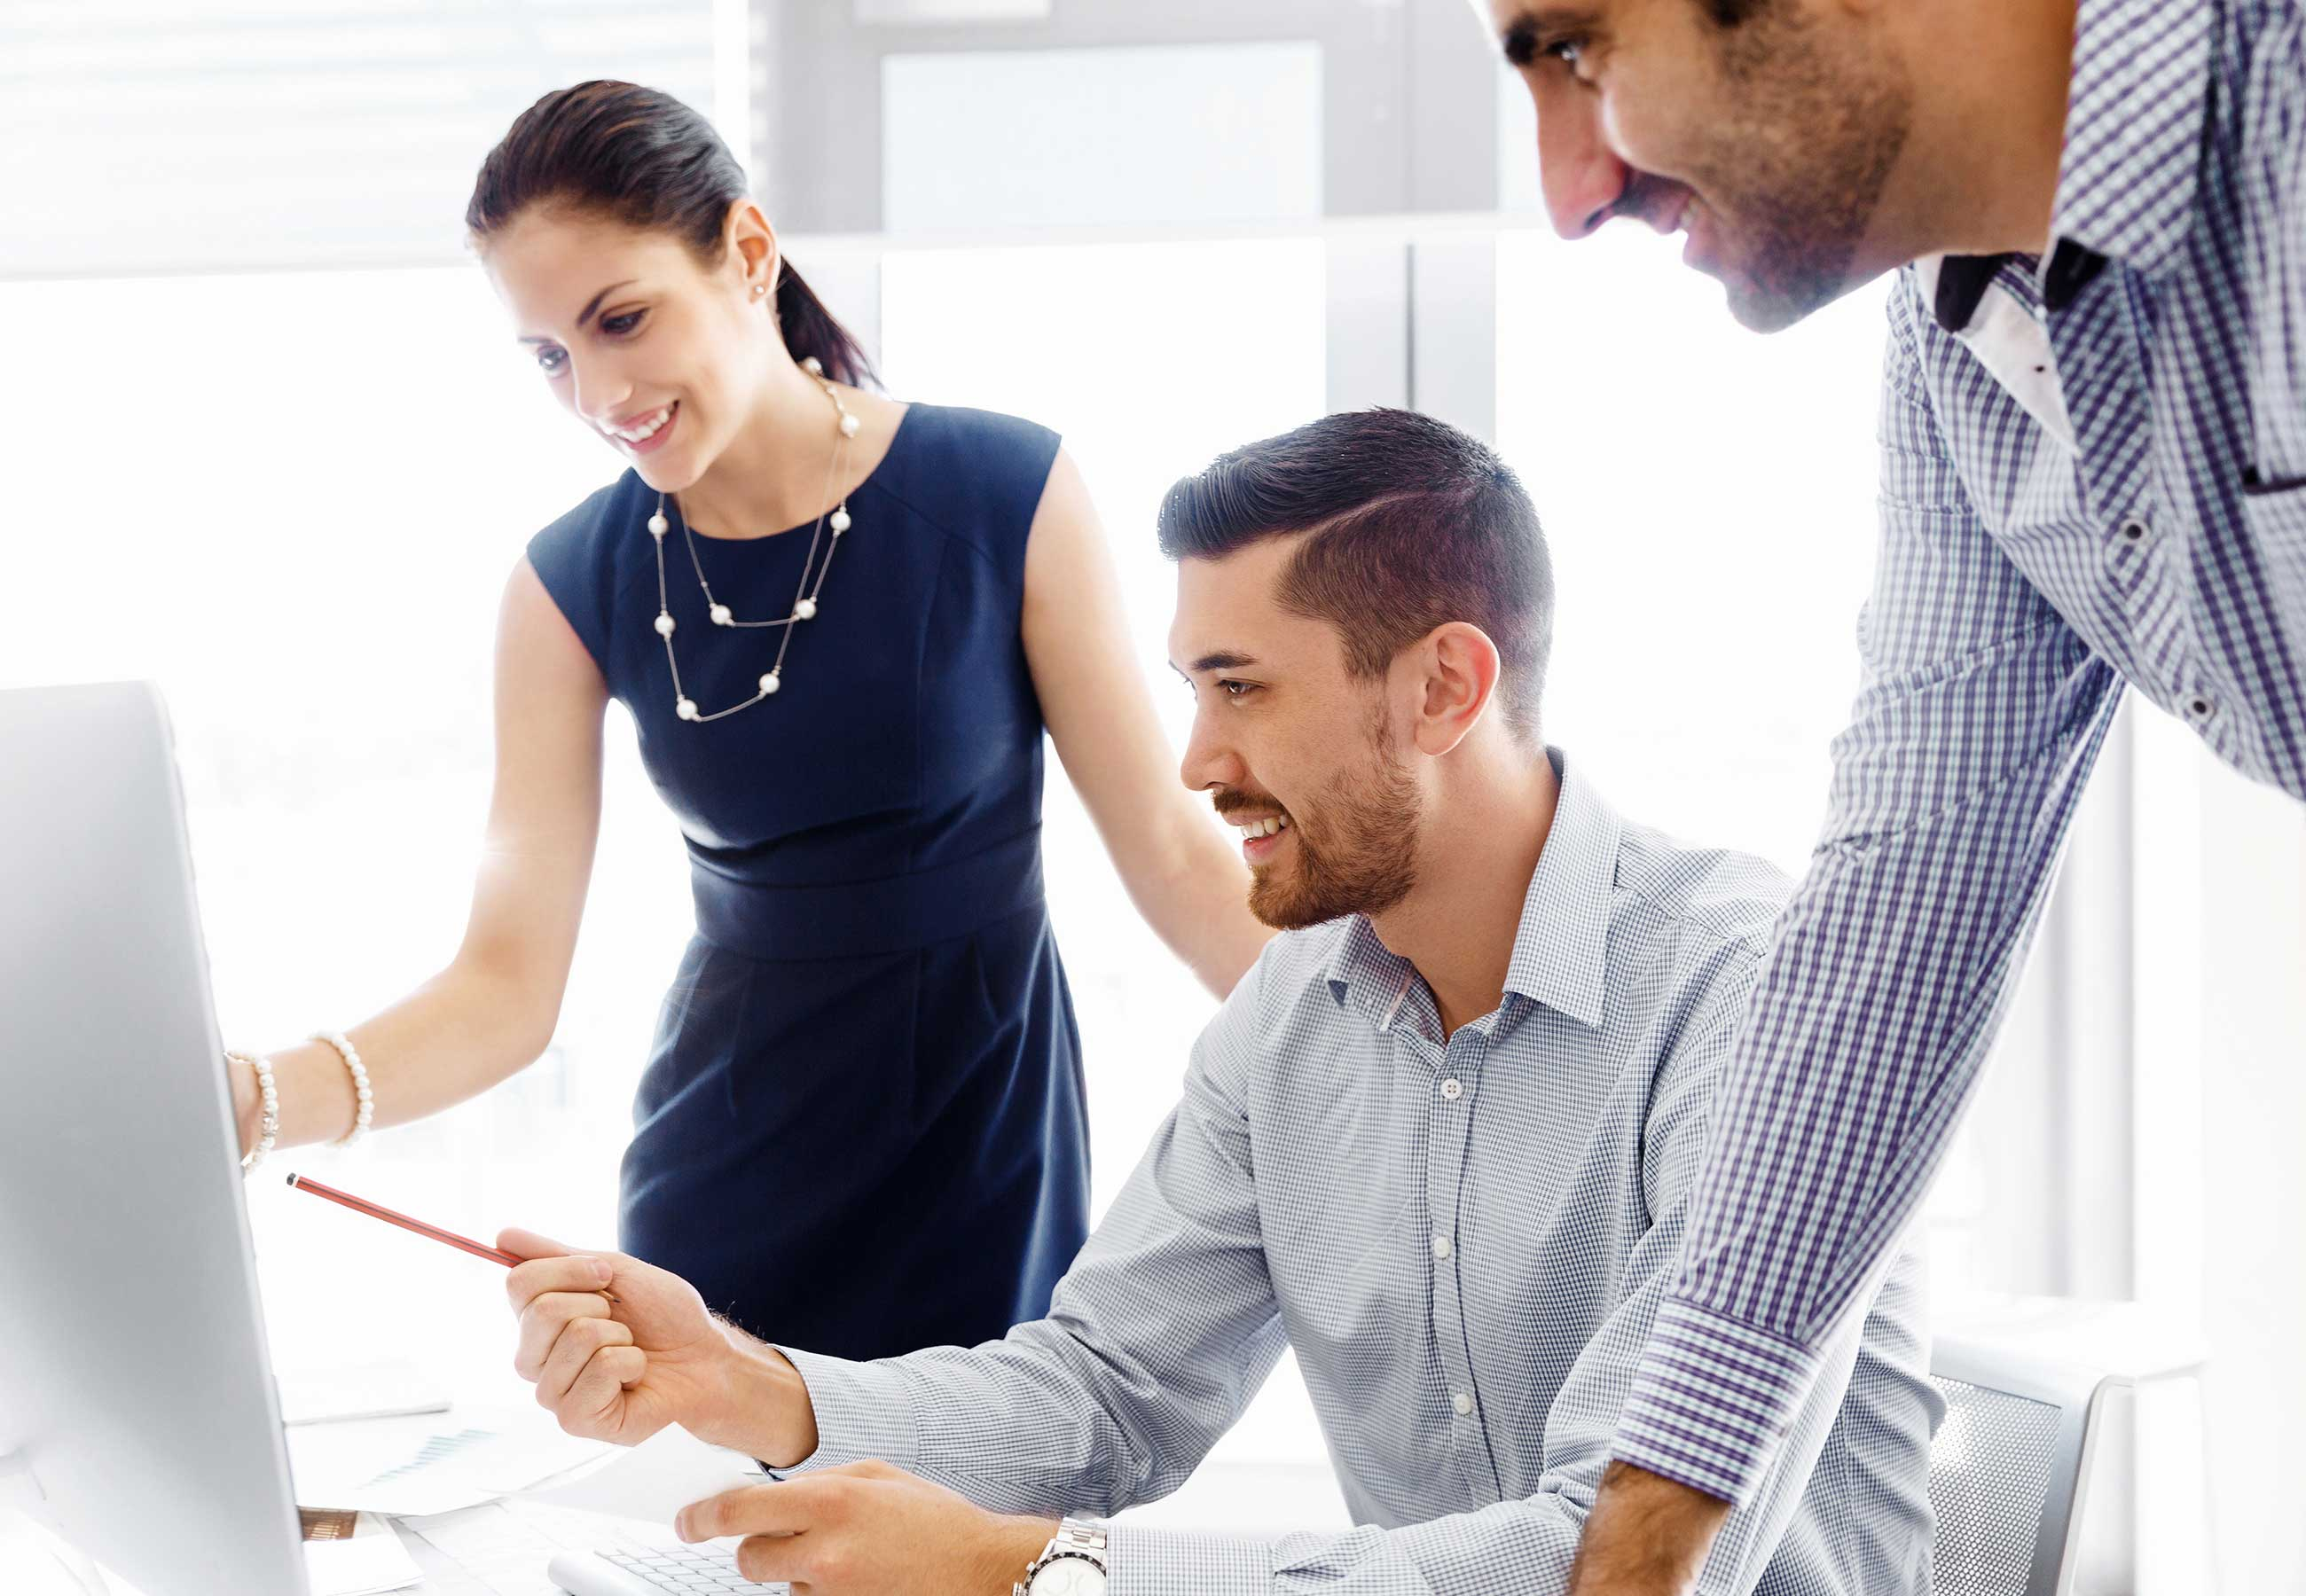 Digital marketing and web development agency